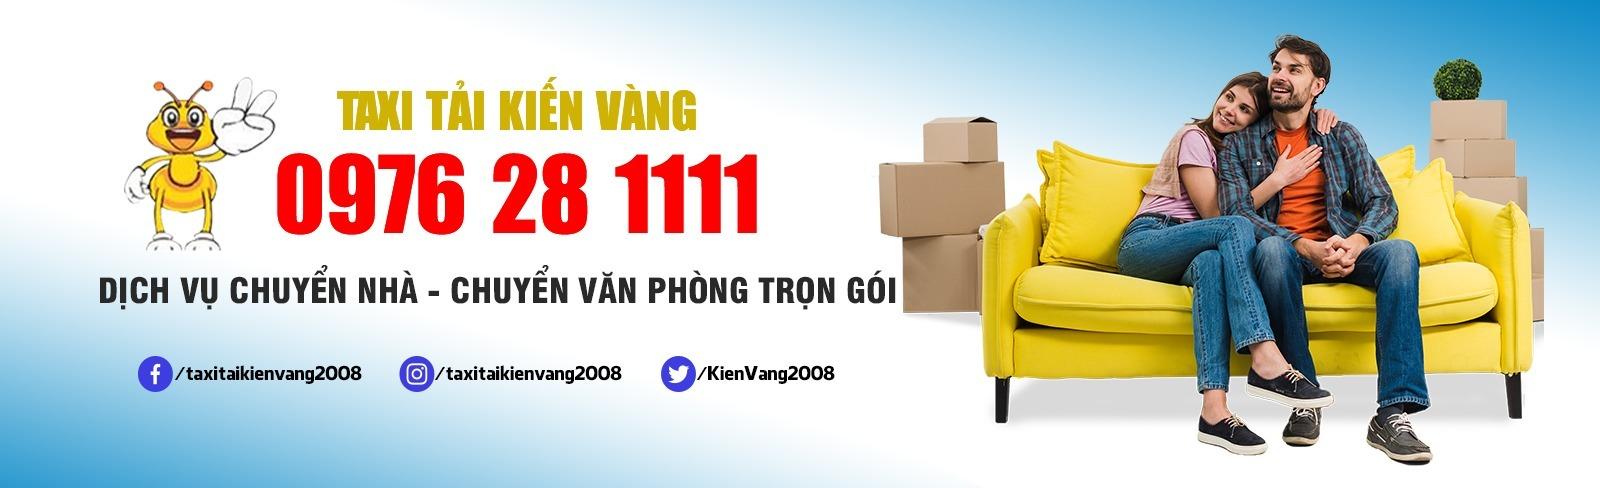 kienvang.net.vn (@kienvangnetvn) Cover Image